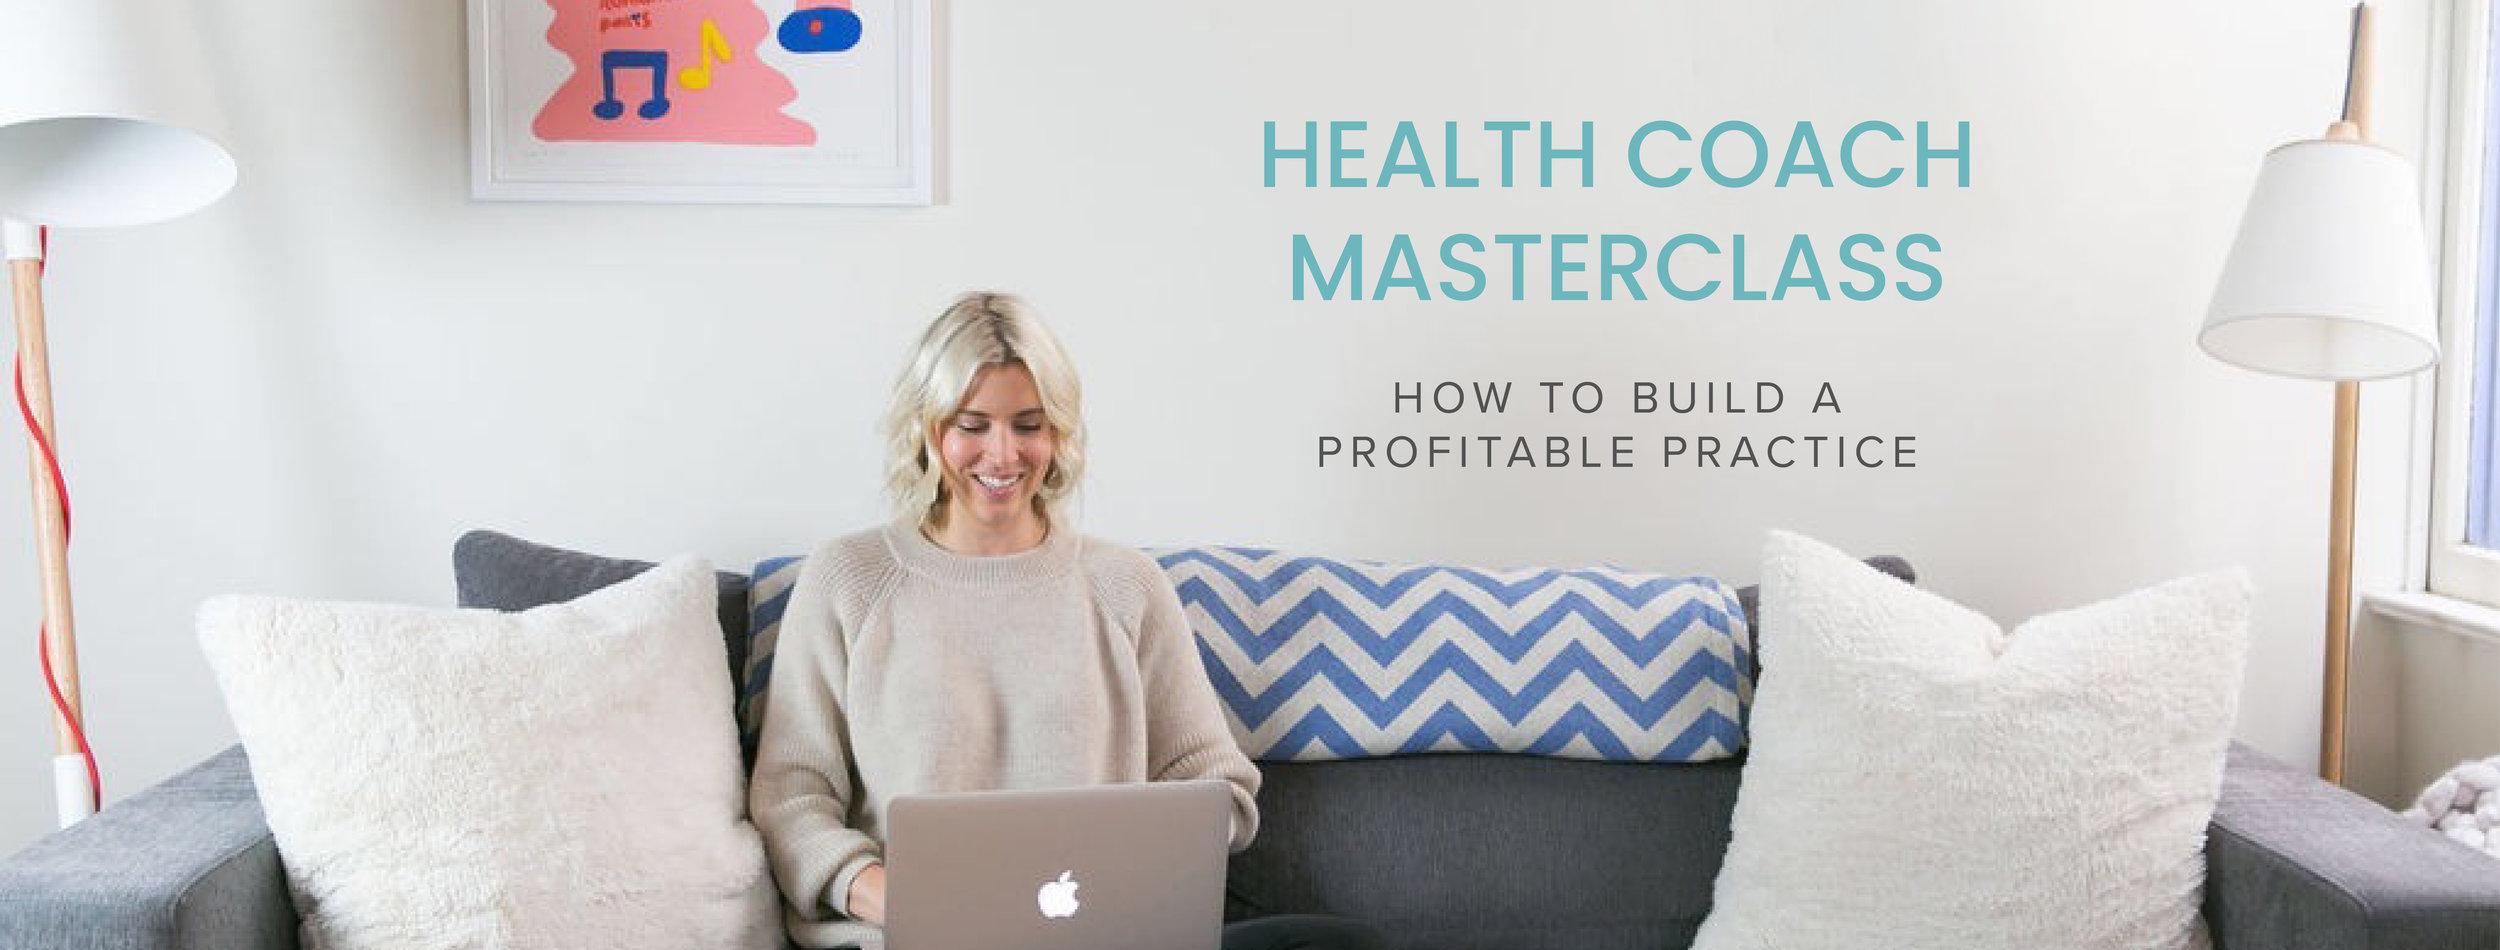 health-coach-masterclass-banner-2.jpg